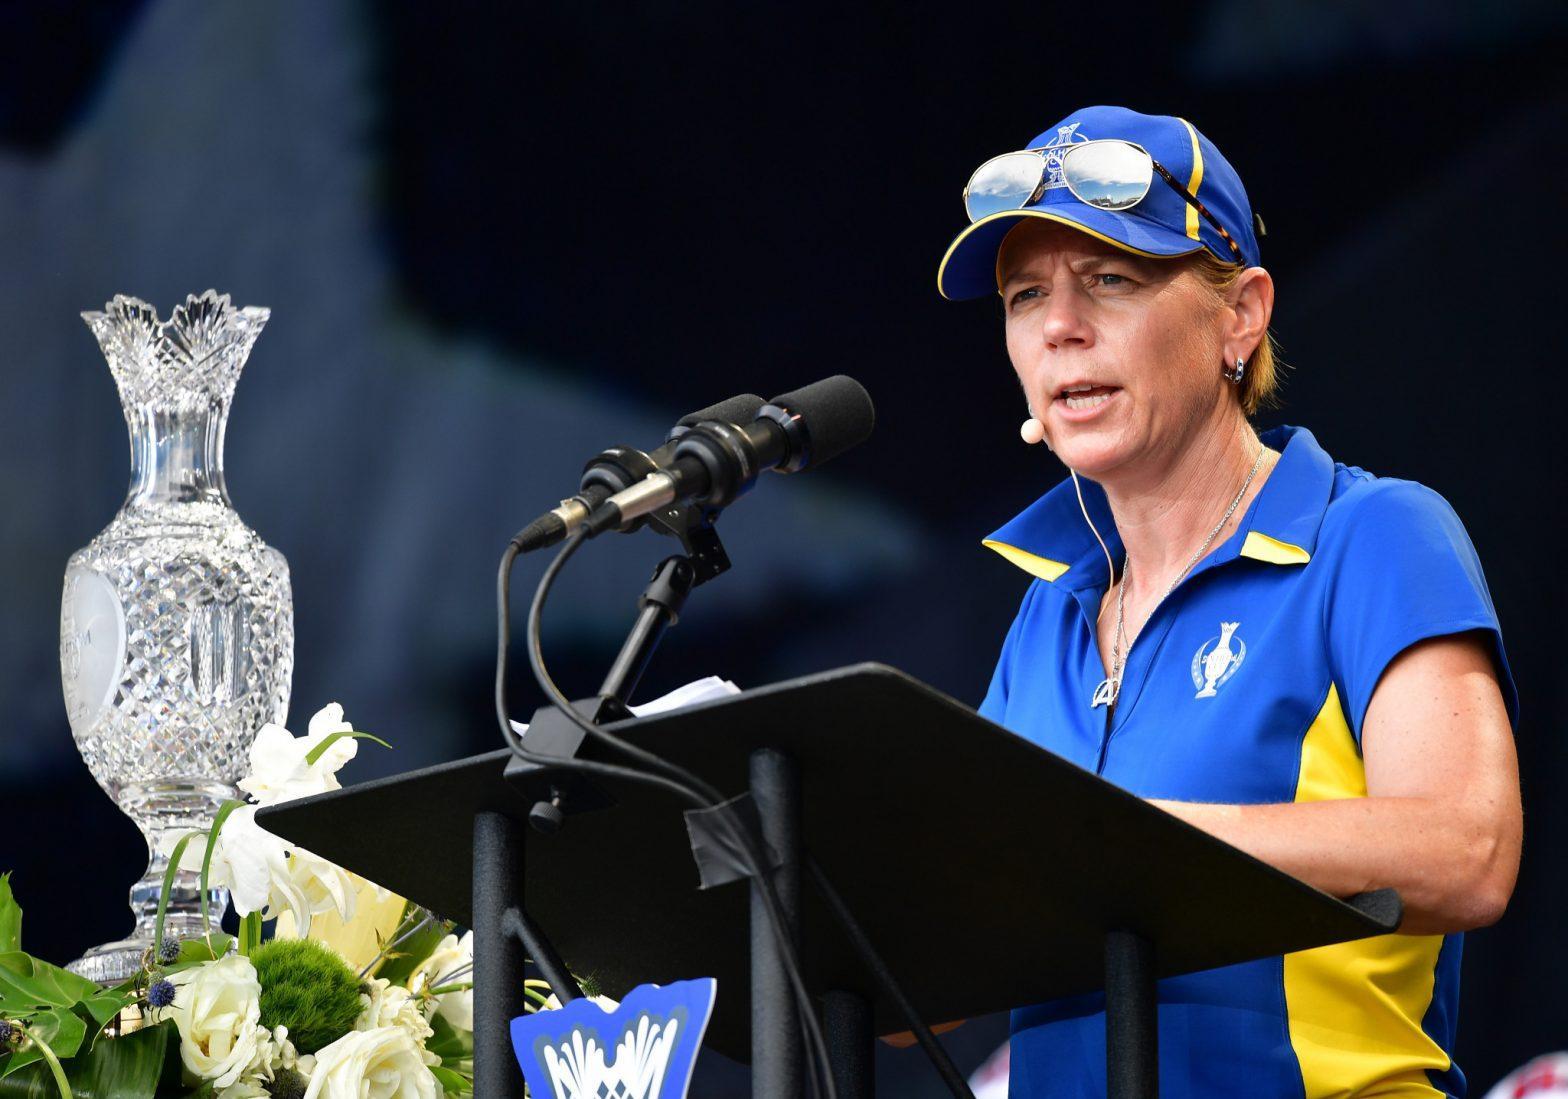 Annika Sorenstam elected president of International Golf Federation_40.1